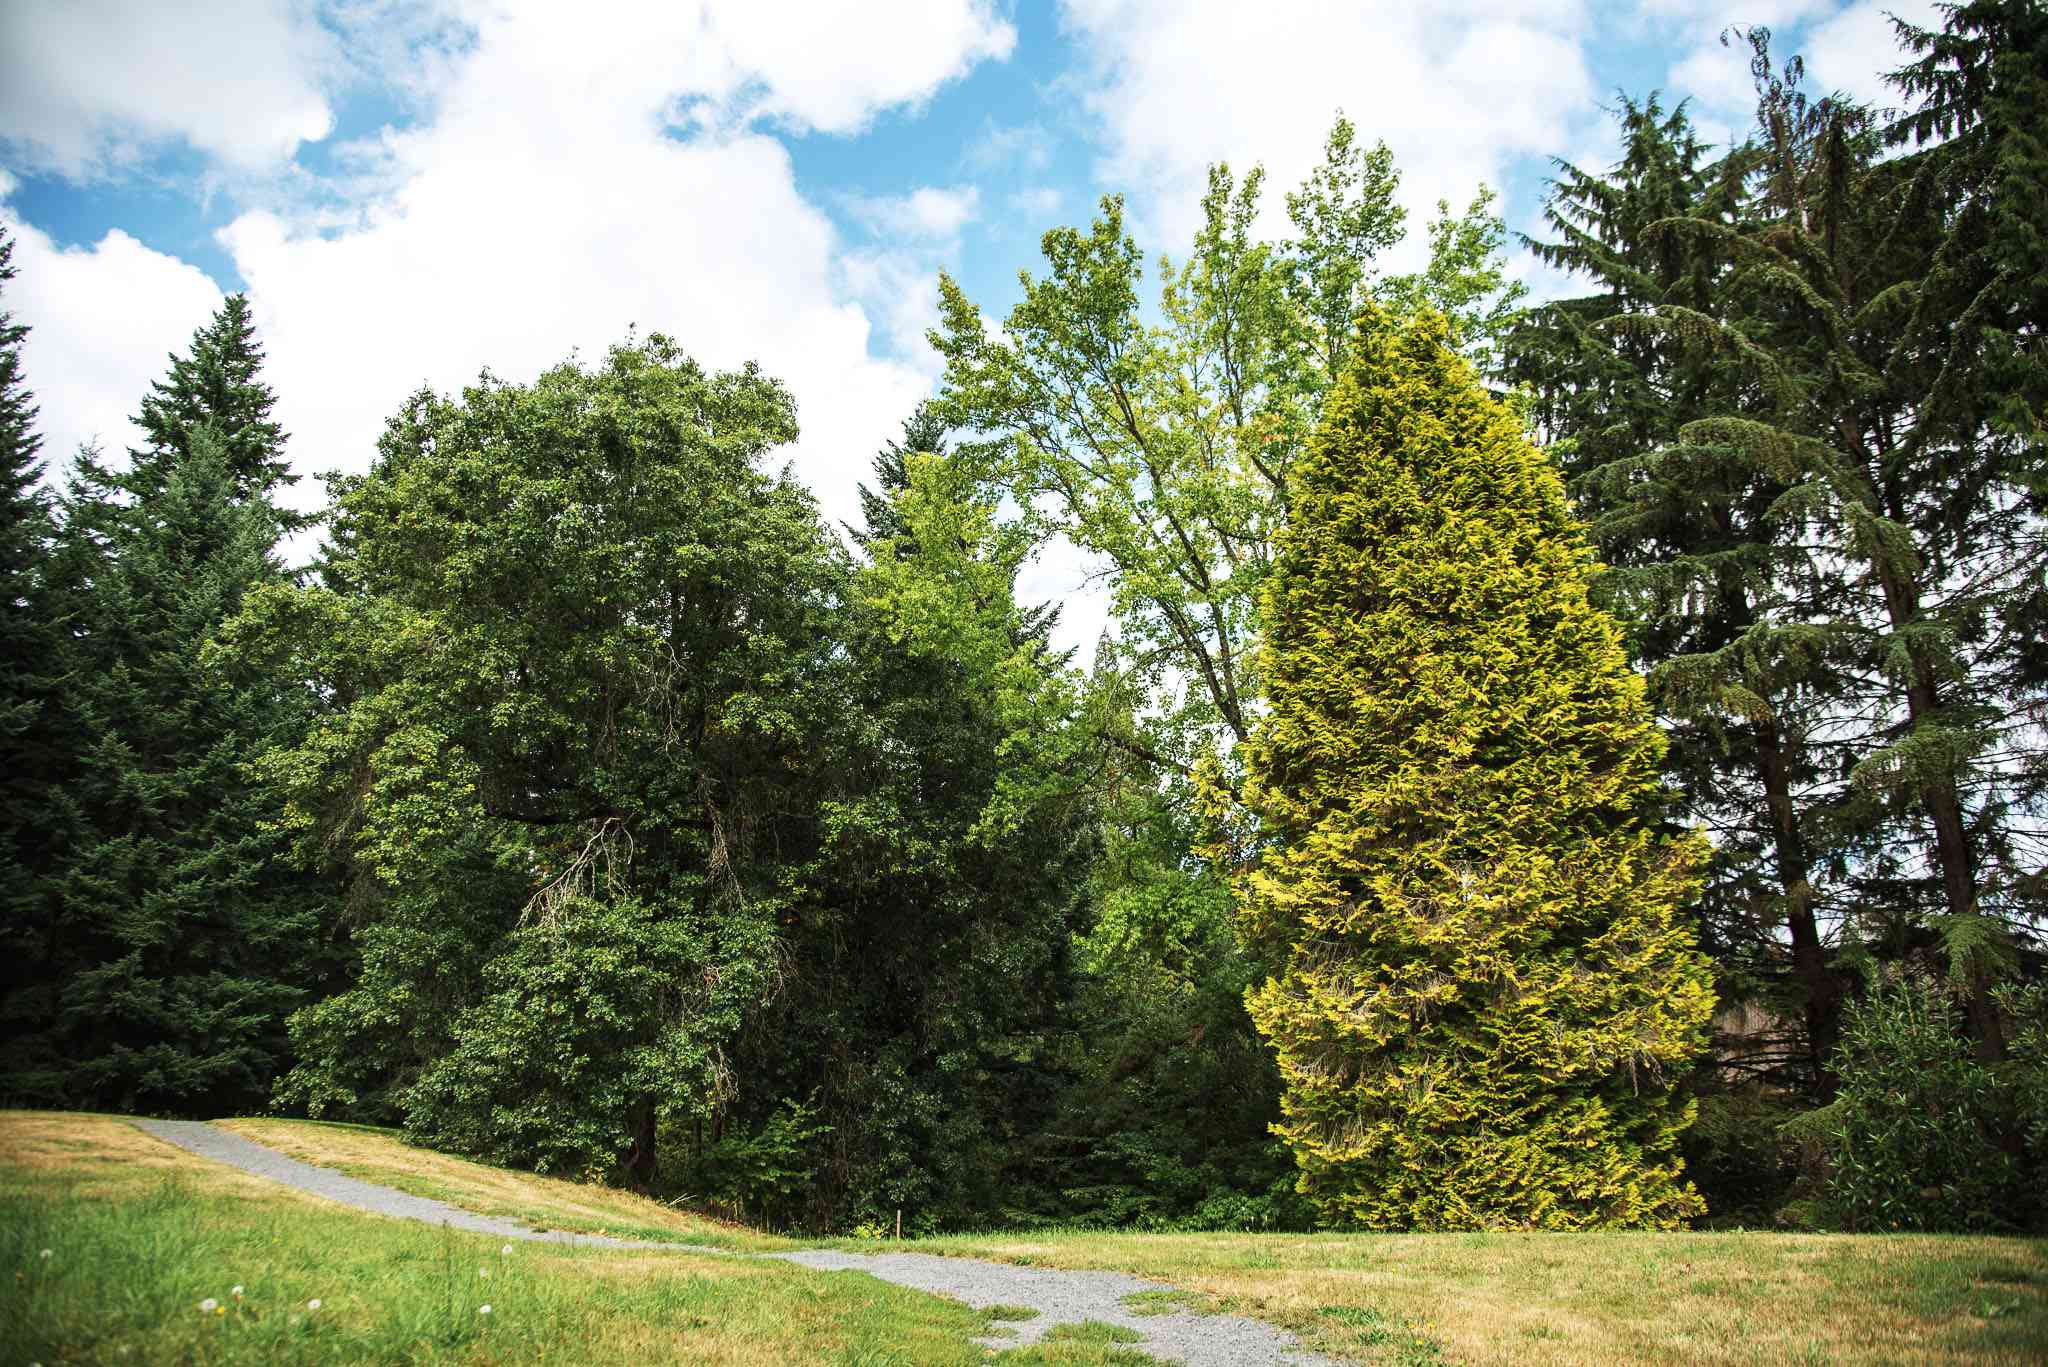 Altos árboles verdes en Forest Park